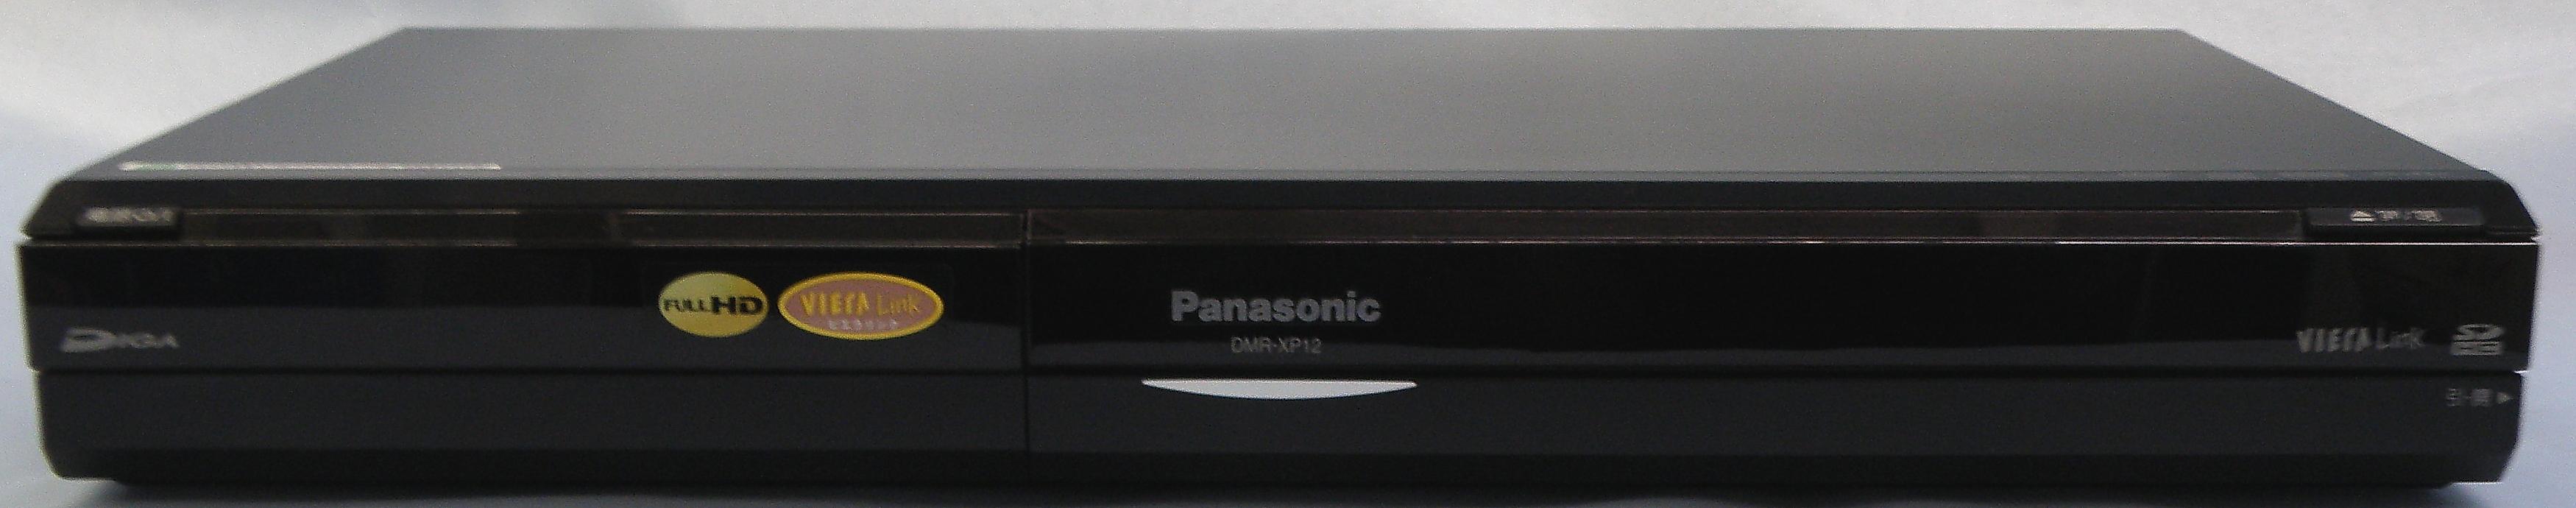 Panasonic DVDレコーダー DMR-XP12